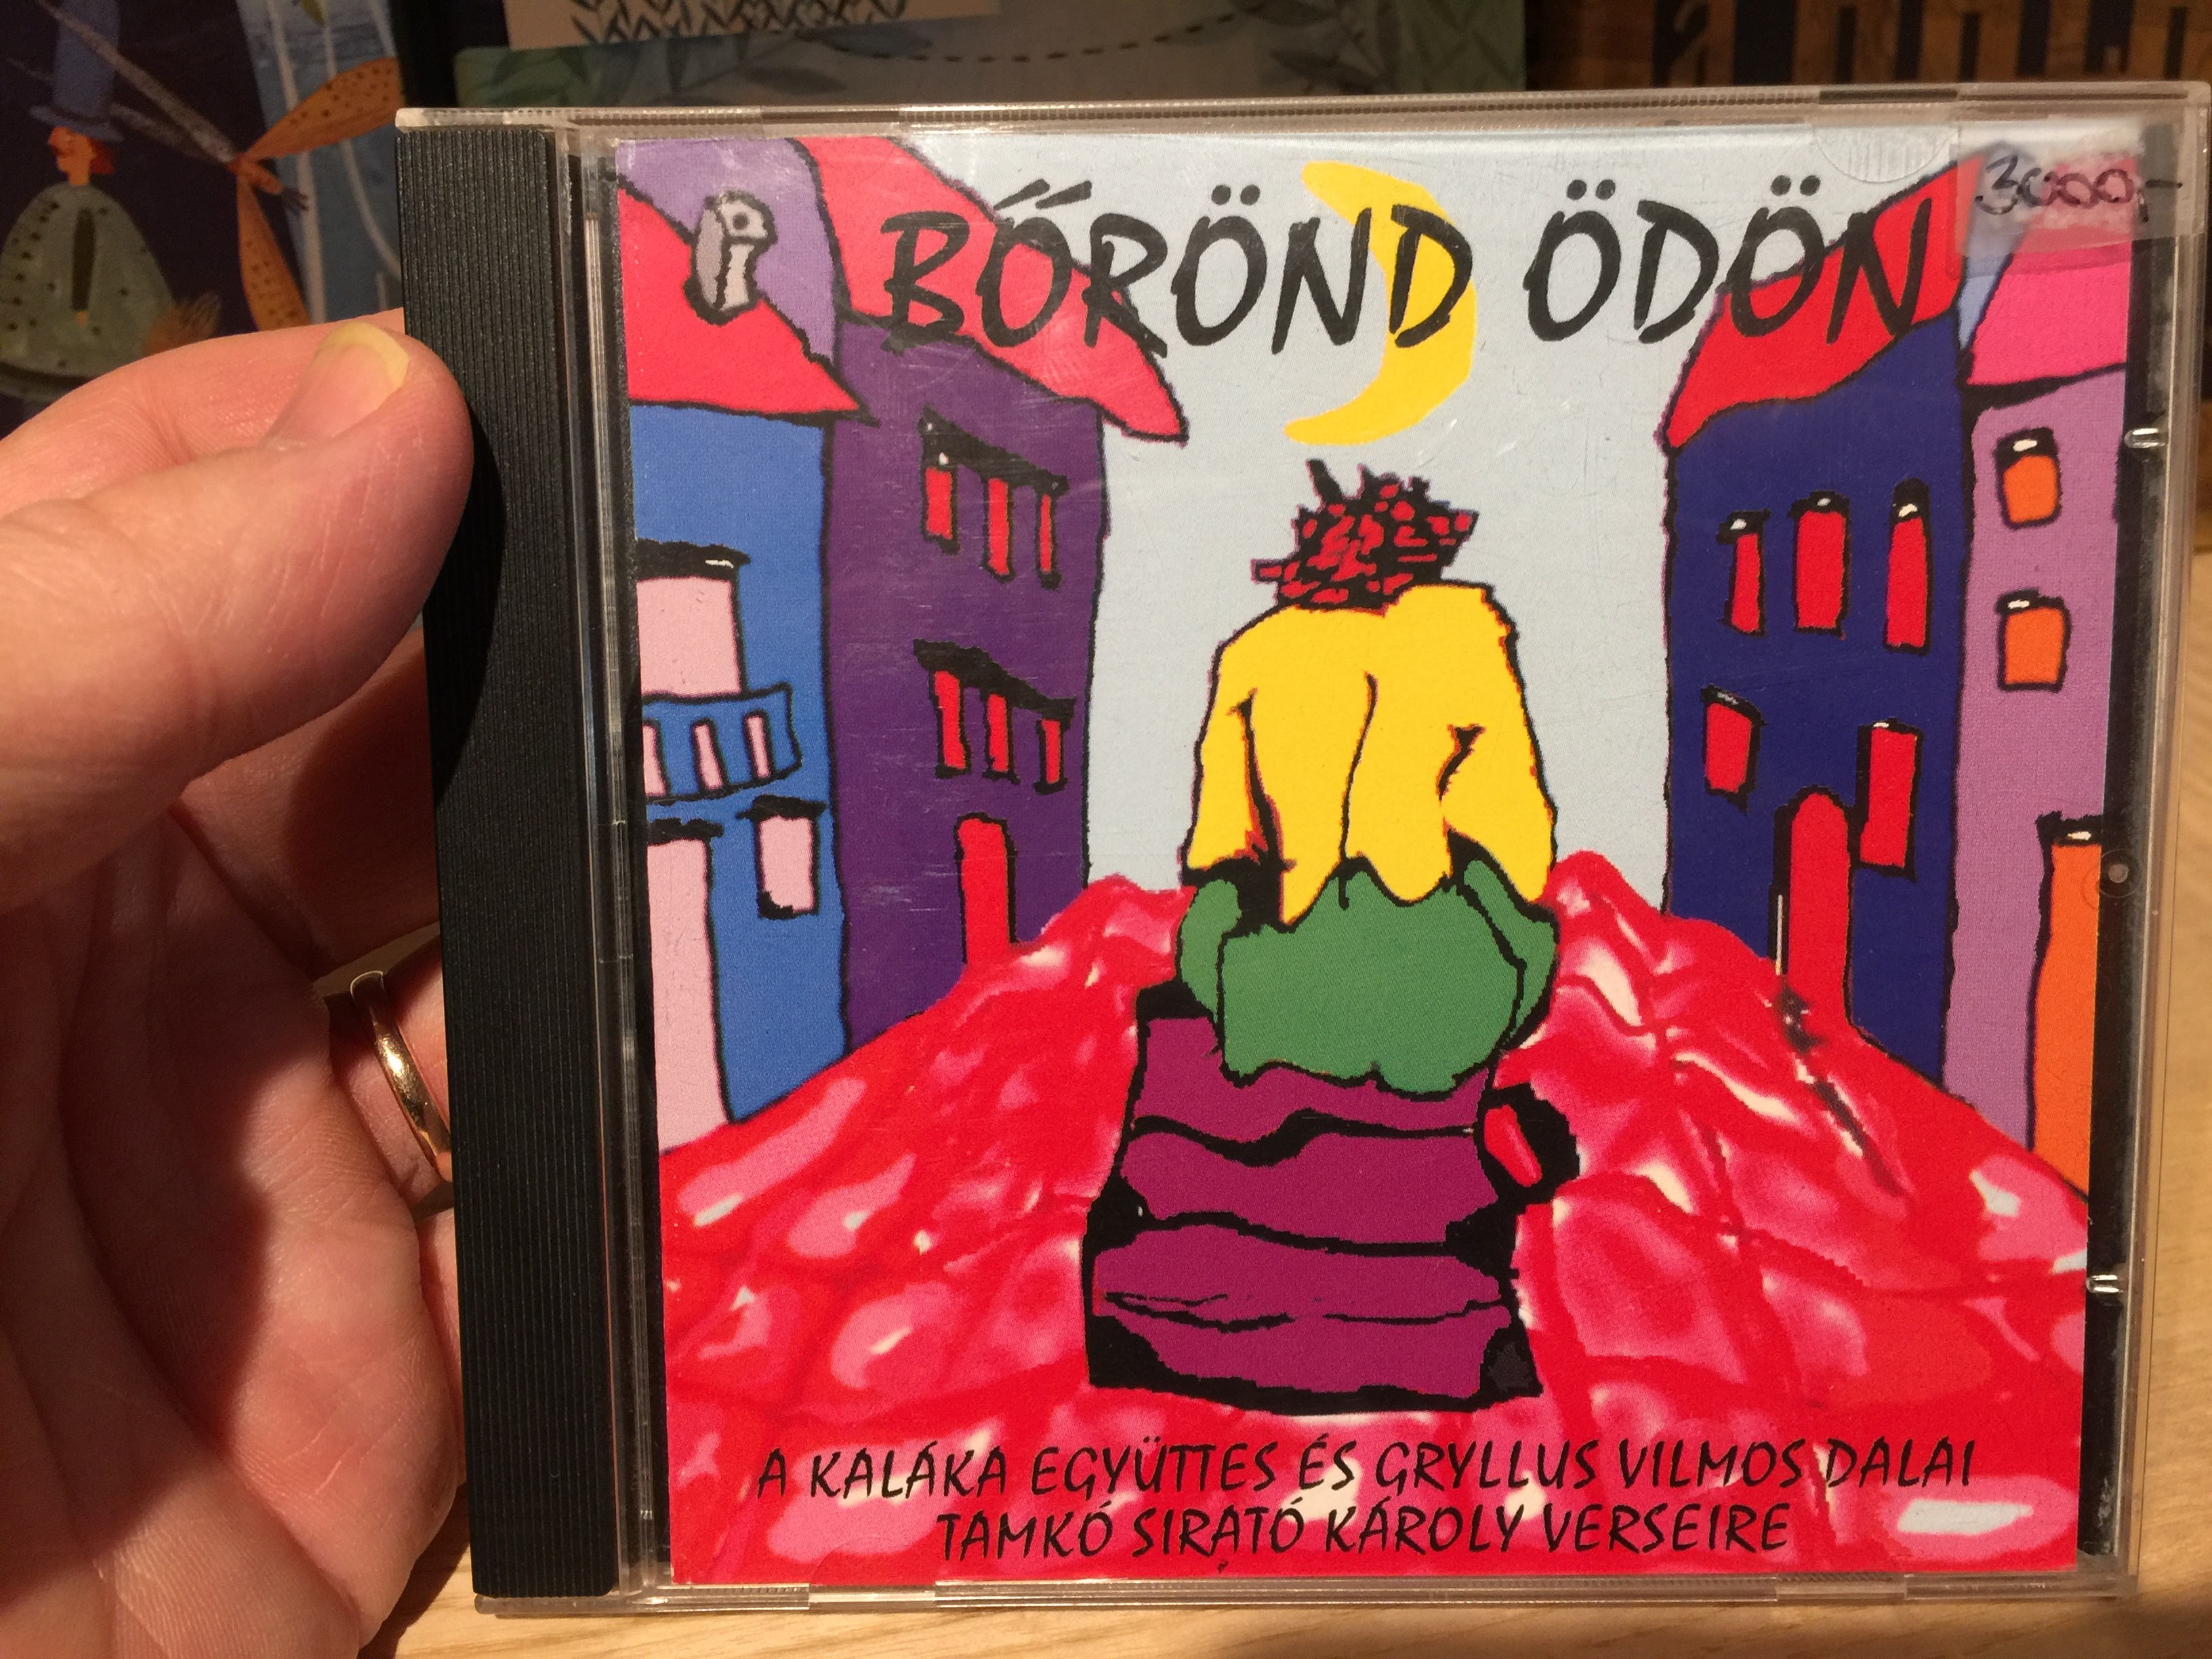 b-r-nd-d-n-a-kal-ka-egyuttes-es-gryllus-vilmos-dalai-tamko-sirato-karoly-verseire-gryllus-audio-cd-1996-gcd-020-1-.jpg